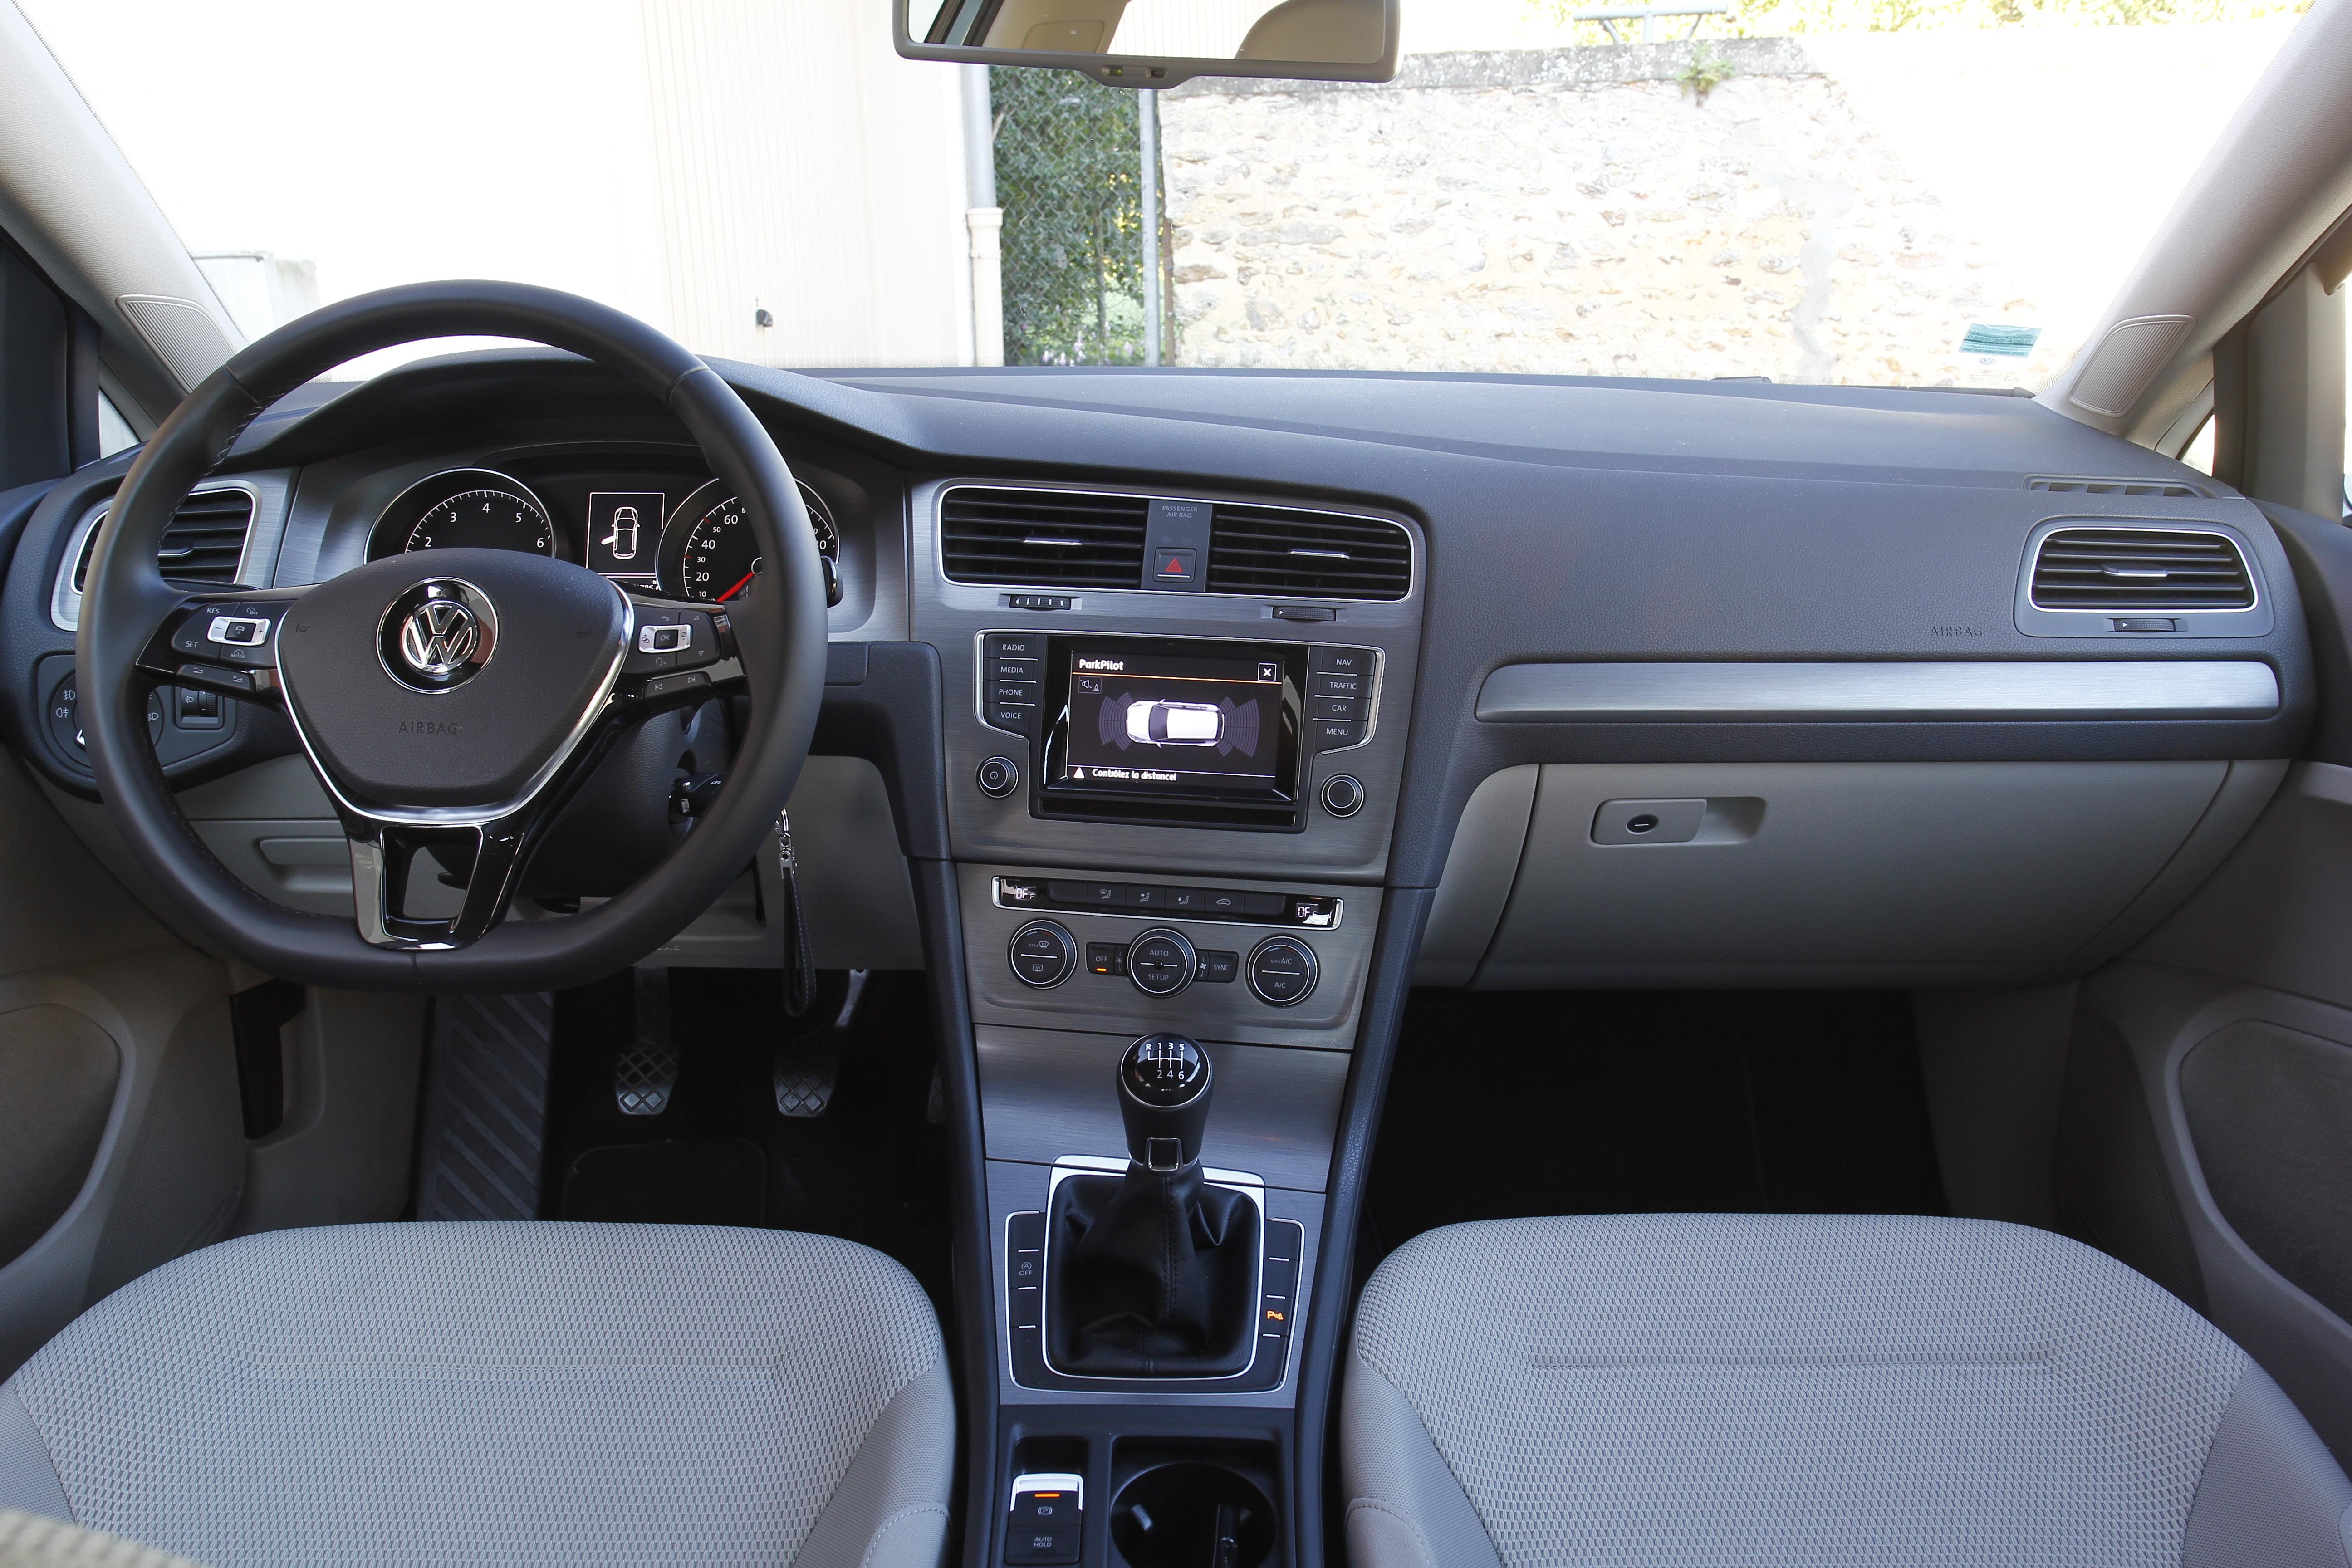 Comparatif vidéo - Peugeot 308 vs Volkswagen Golf : calife à la place du calife